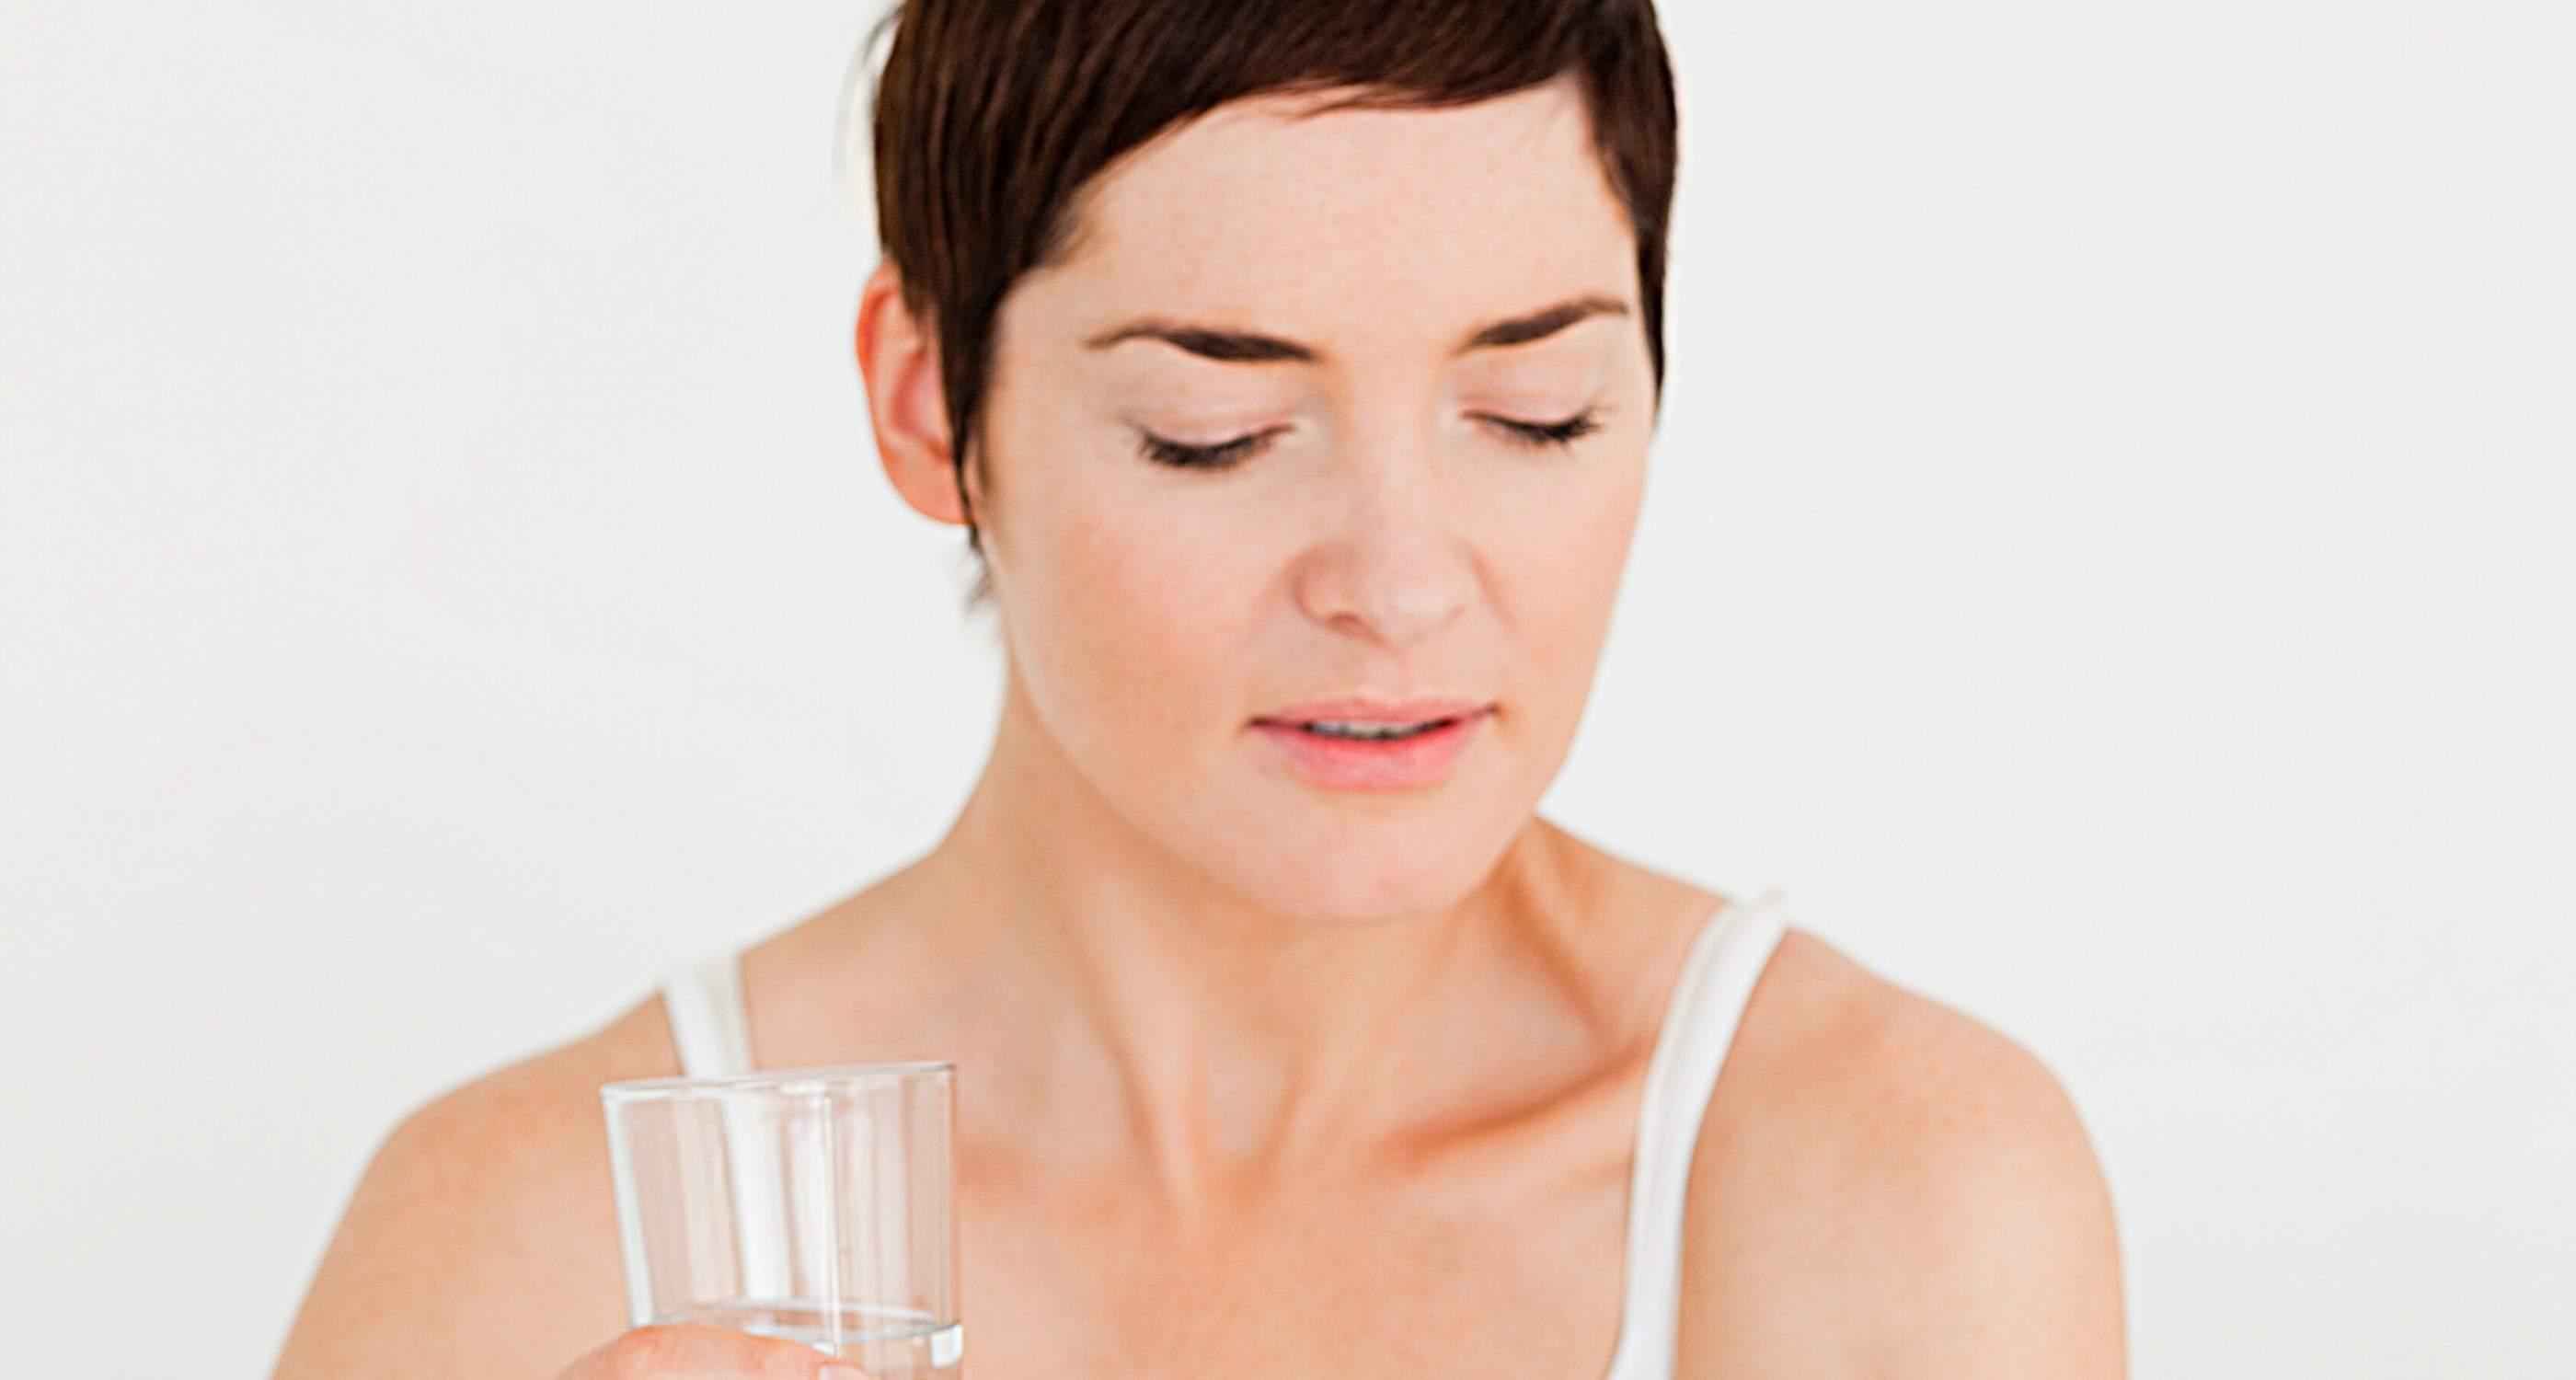 biotin-vitamins-supplements-hair-growth